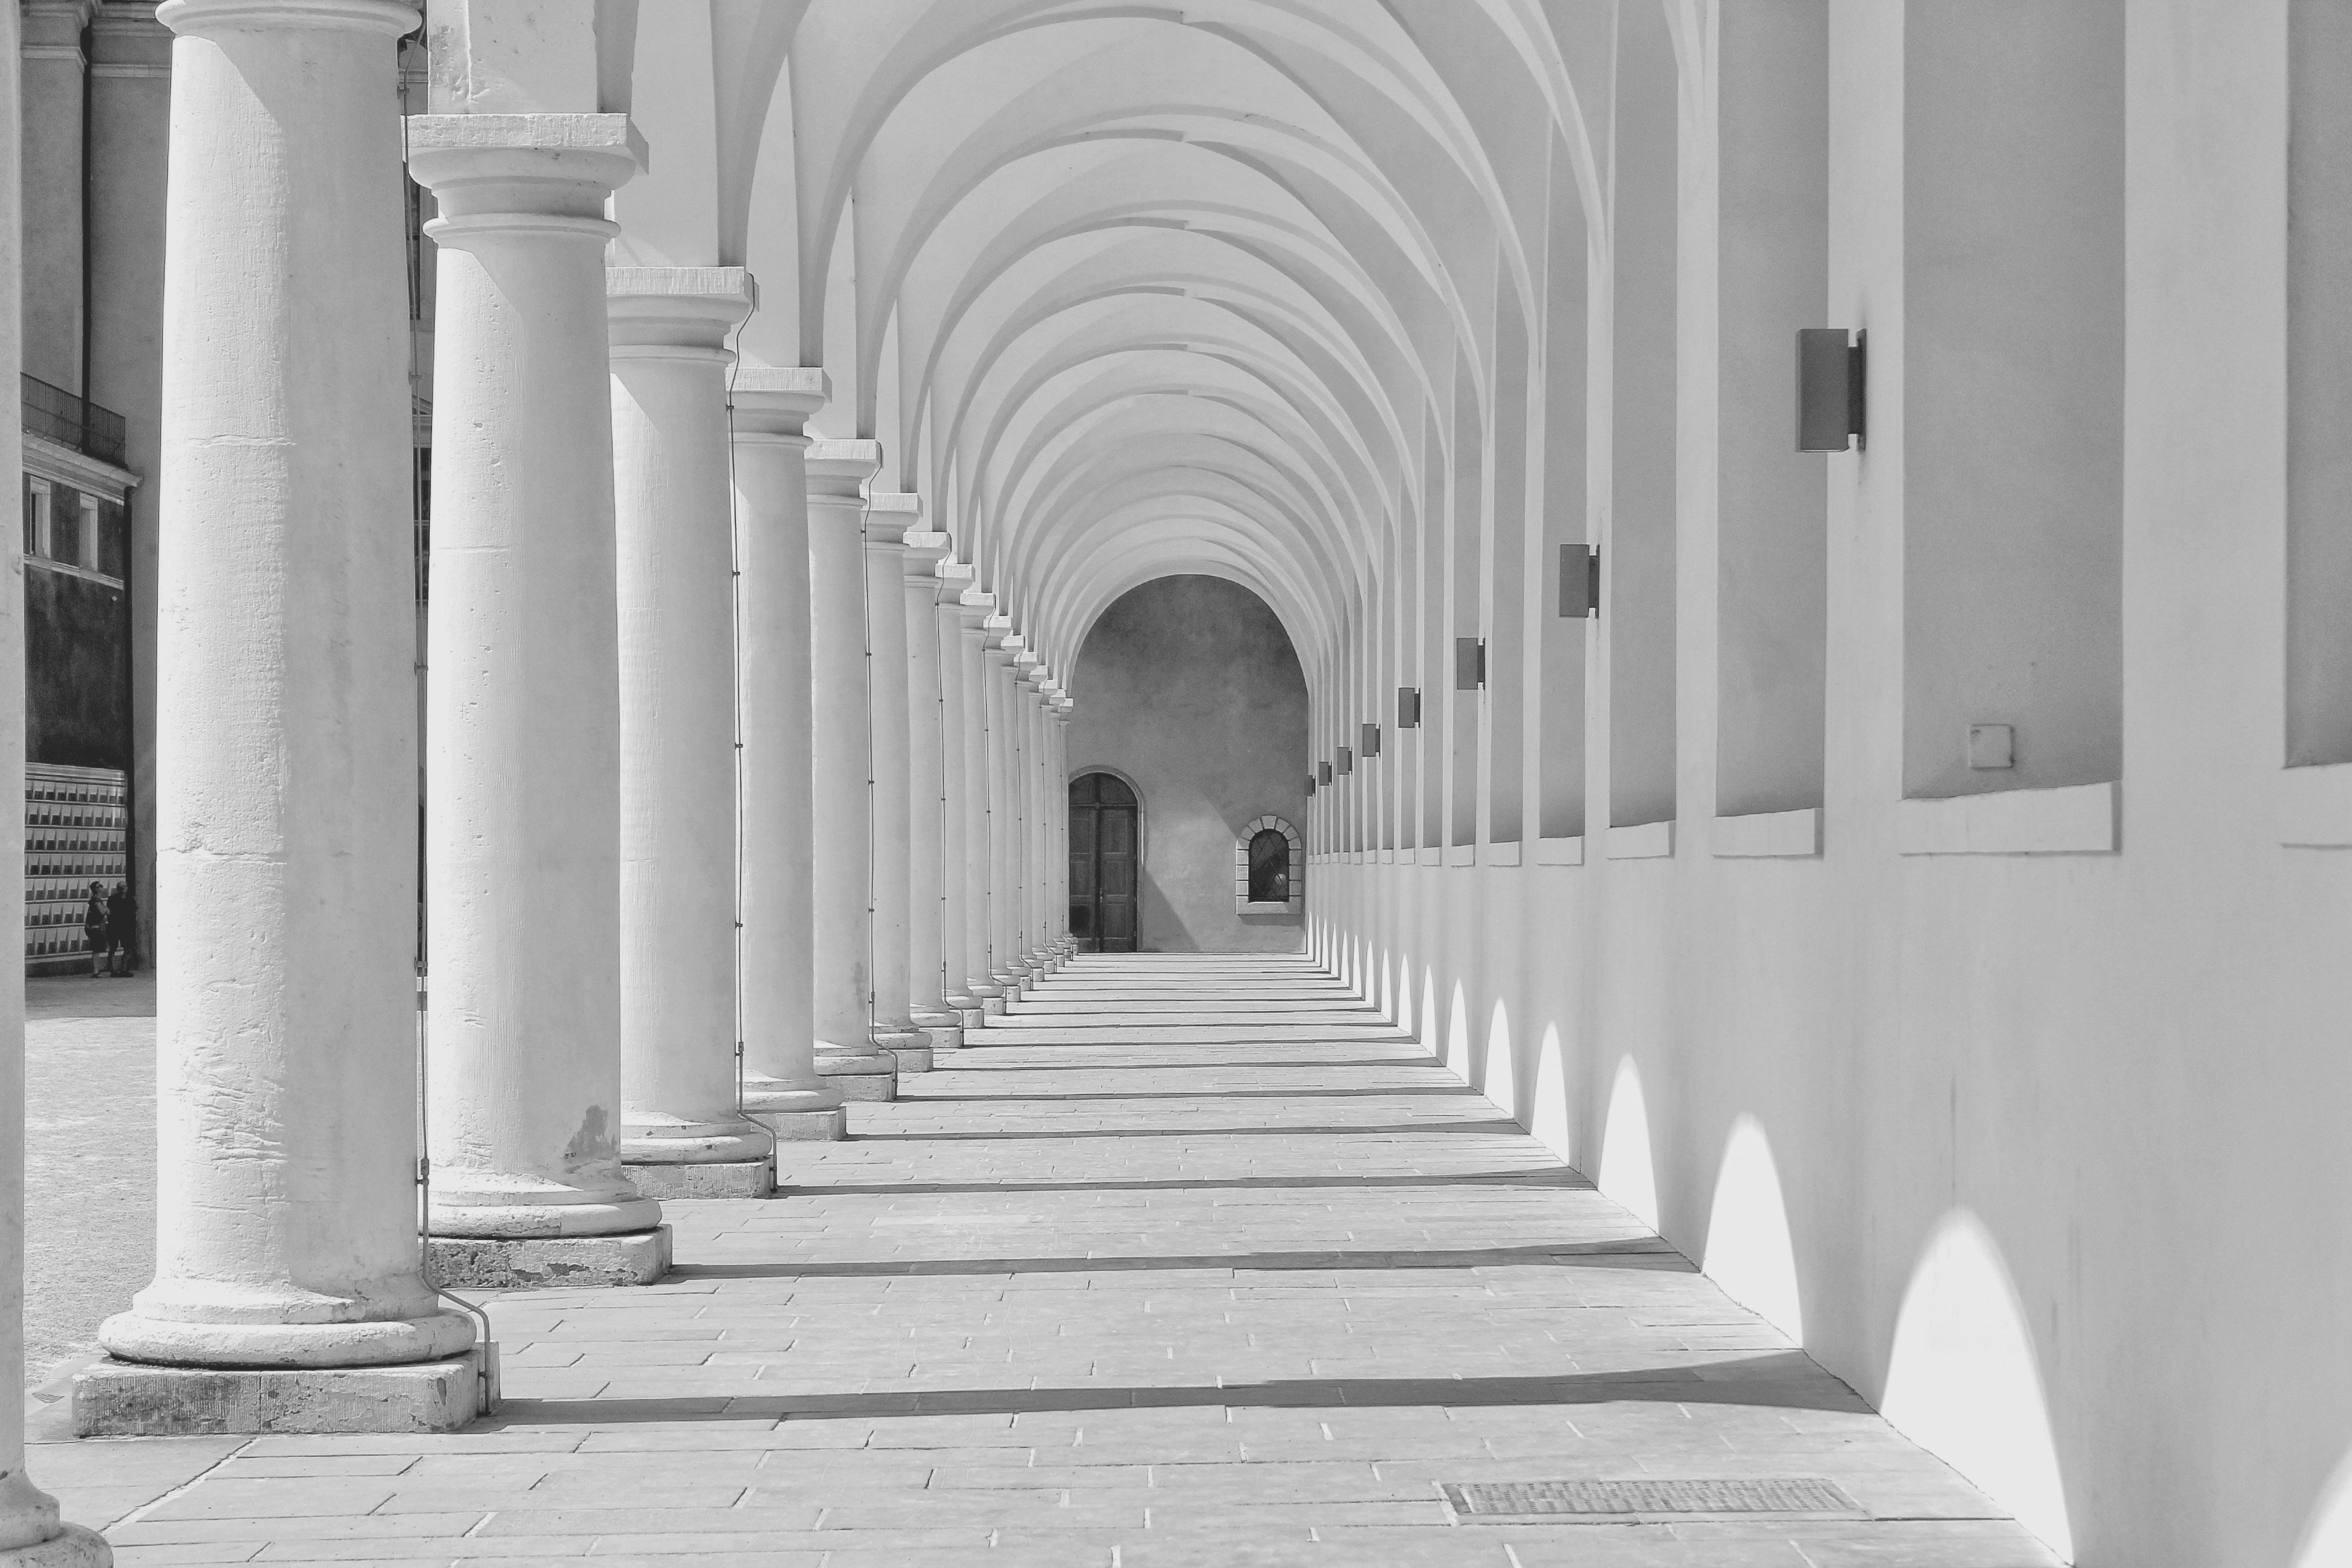 Kostenloses Stock Foto zu archi, architettura, dresda, finestra ad arco